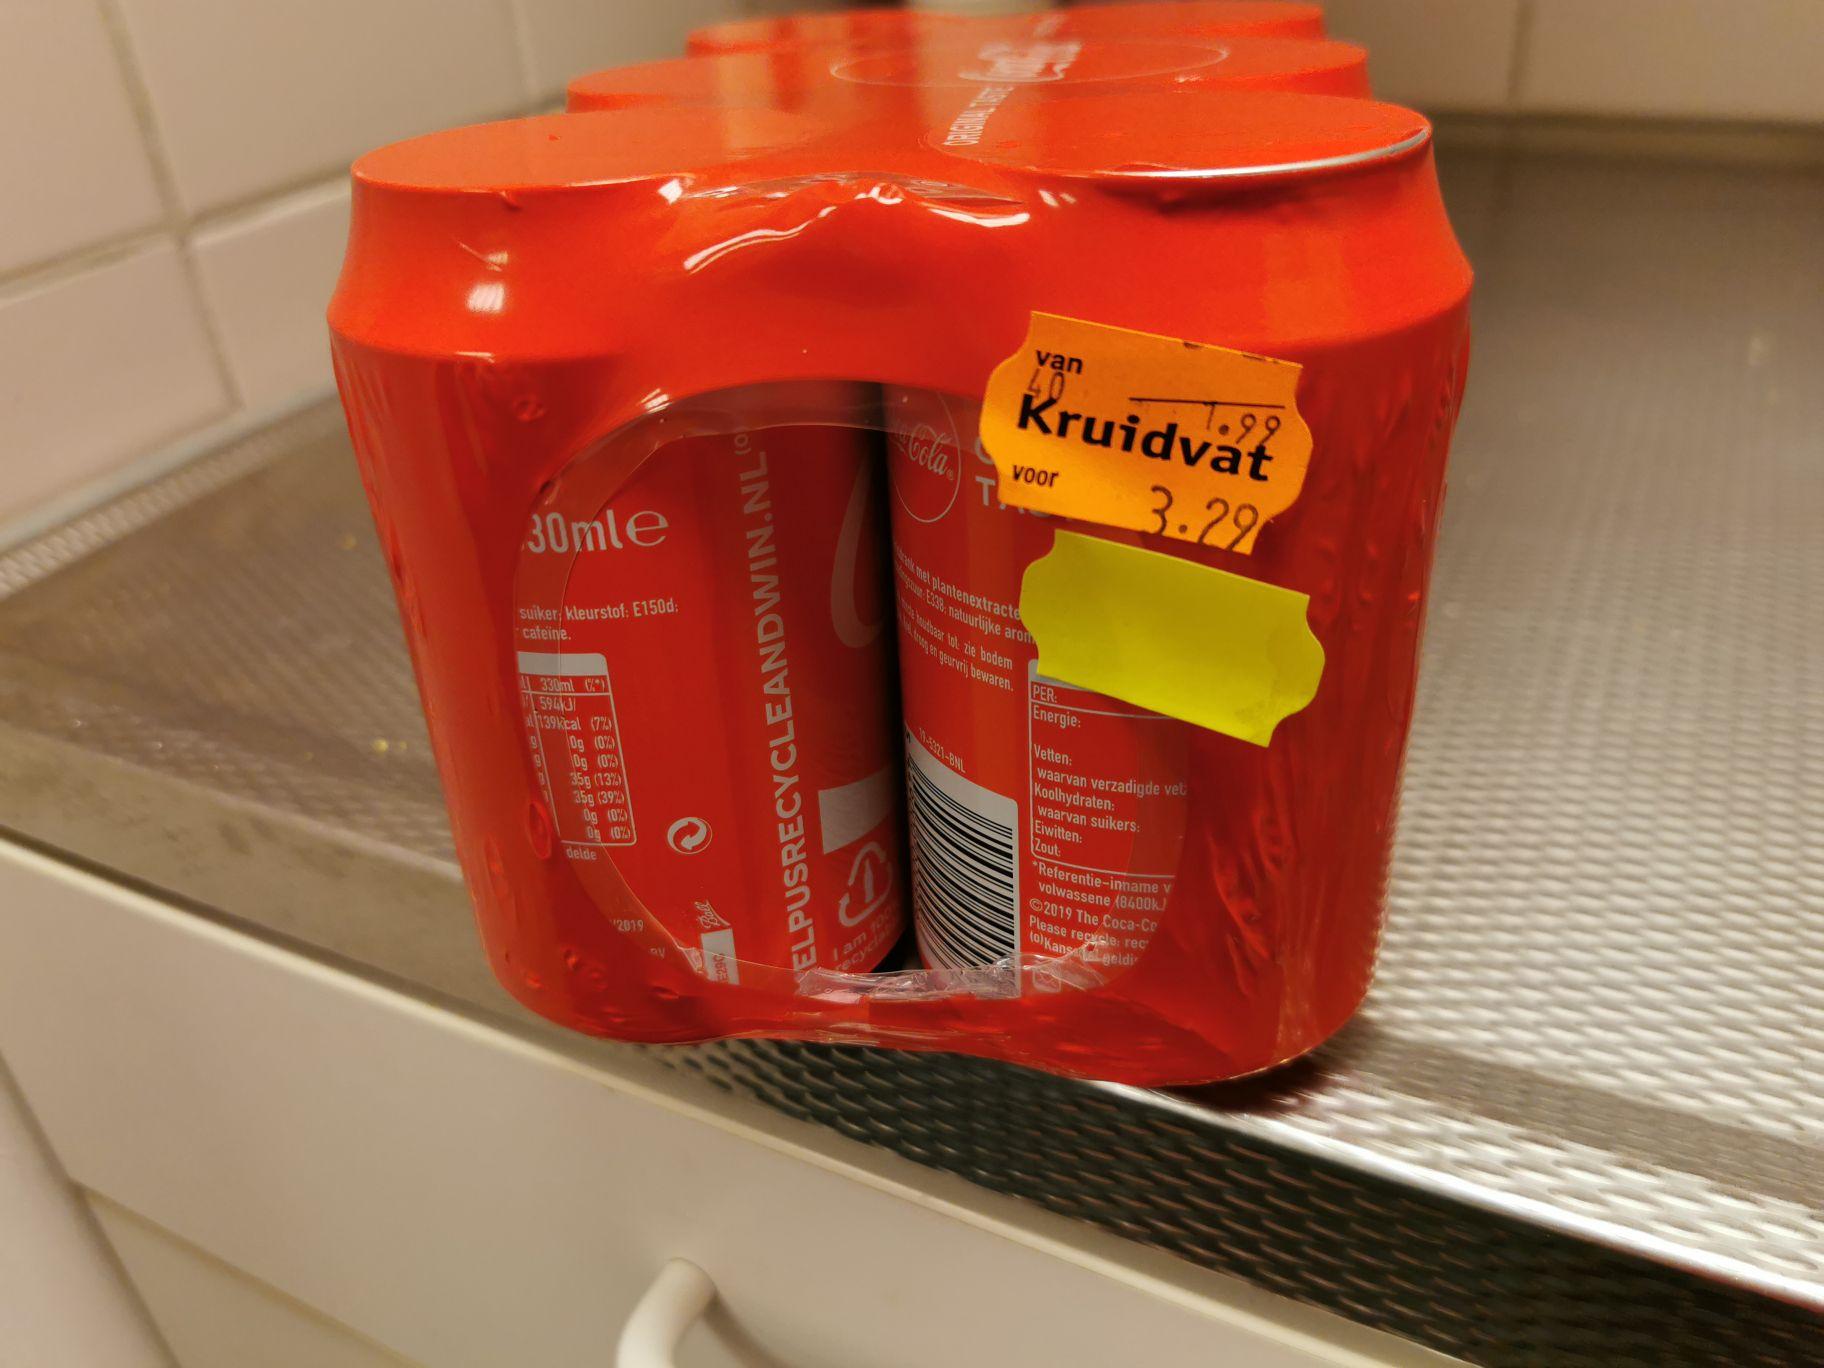 6 blikjes coca cola @ Kruidvat lokaal?